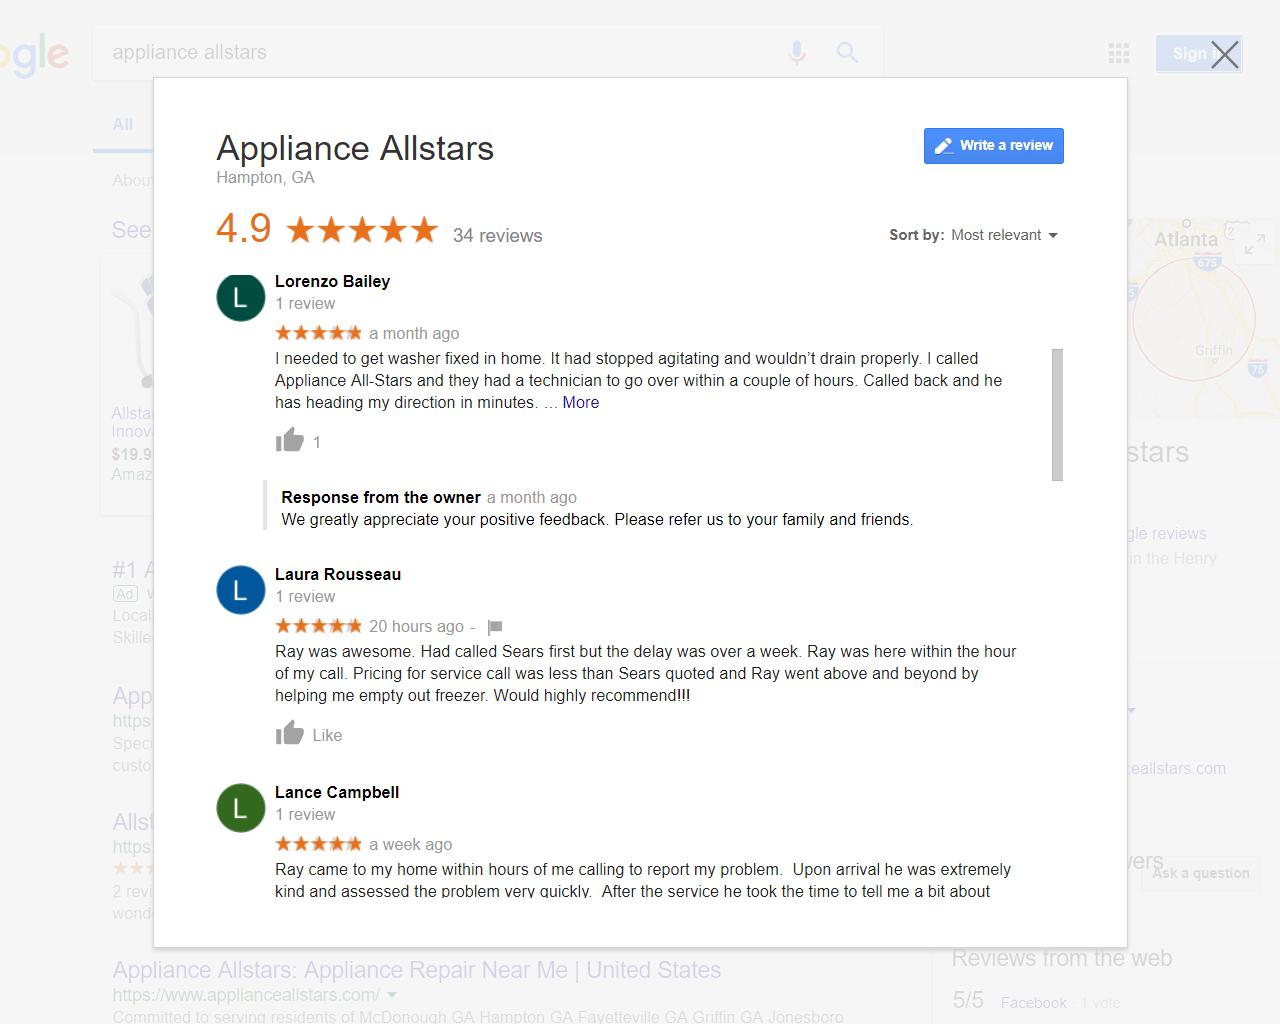 Appliance Allstars Appliance Repair testimonials